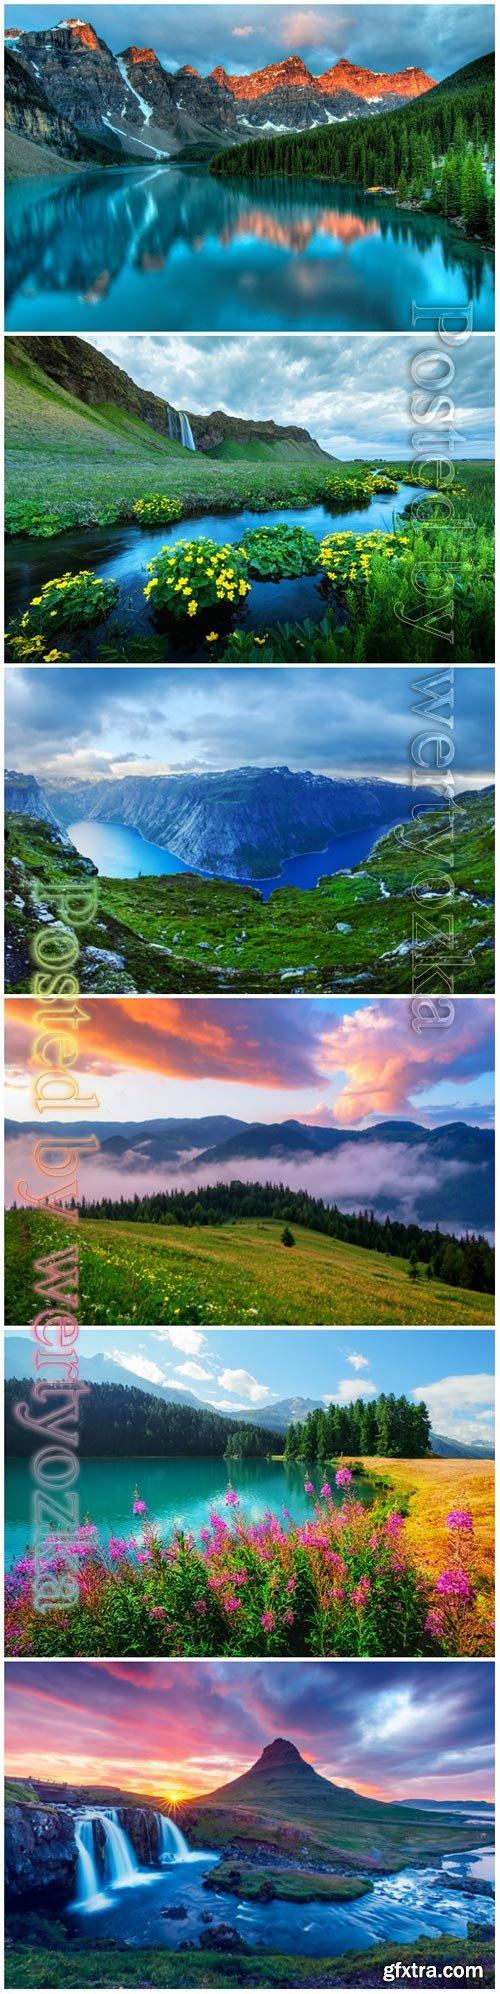 Nature, landscapes beautiful stock photo